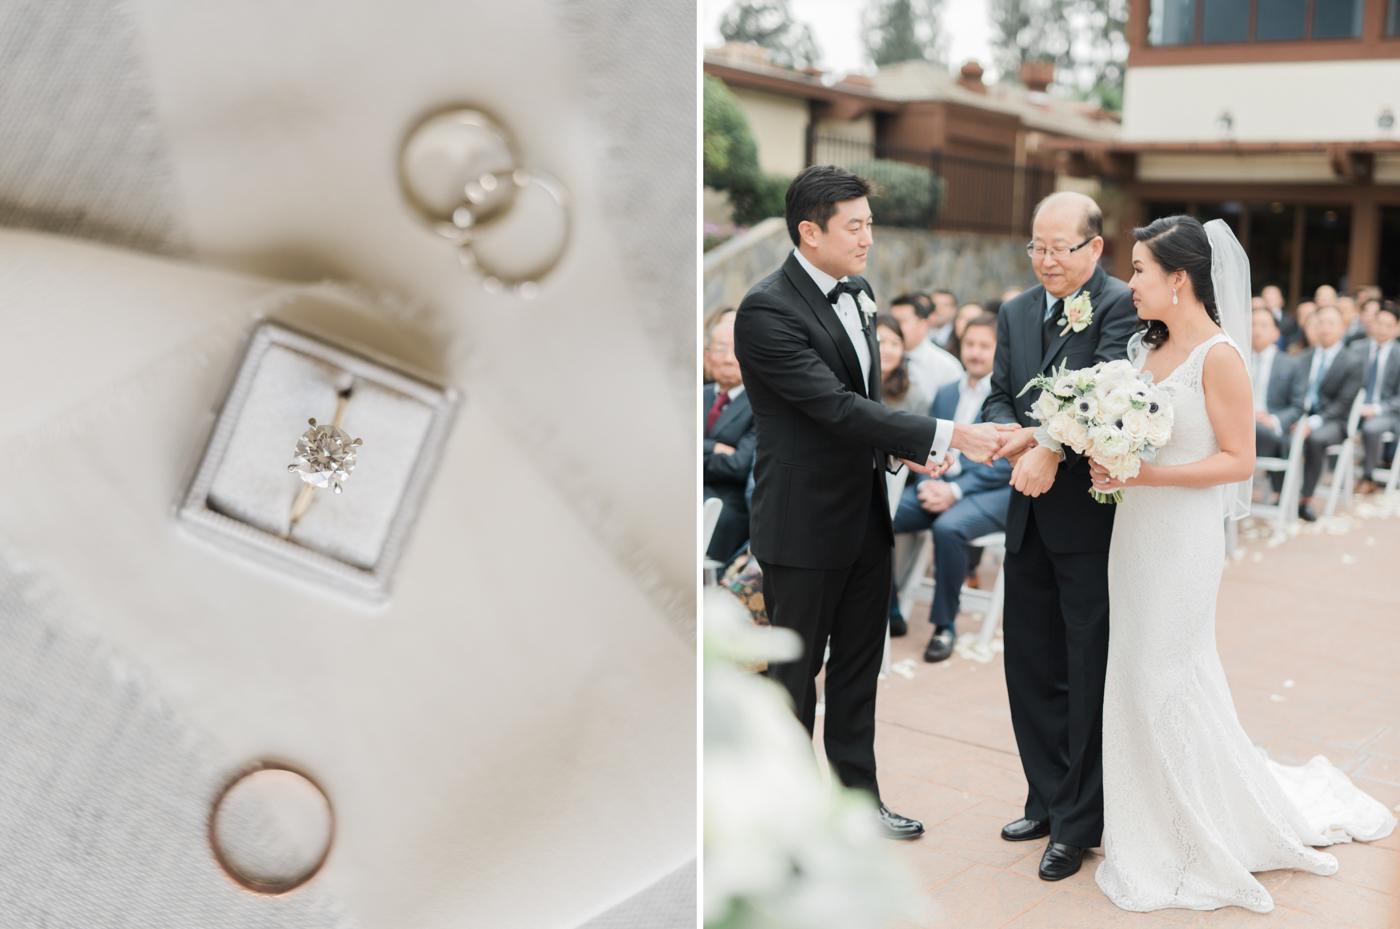 Friendly_Hills_Country_Club_fine_art_wedding_photographer_los_angeles_paris-29.jpg